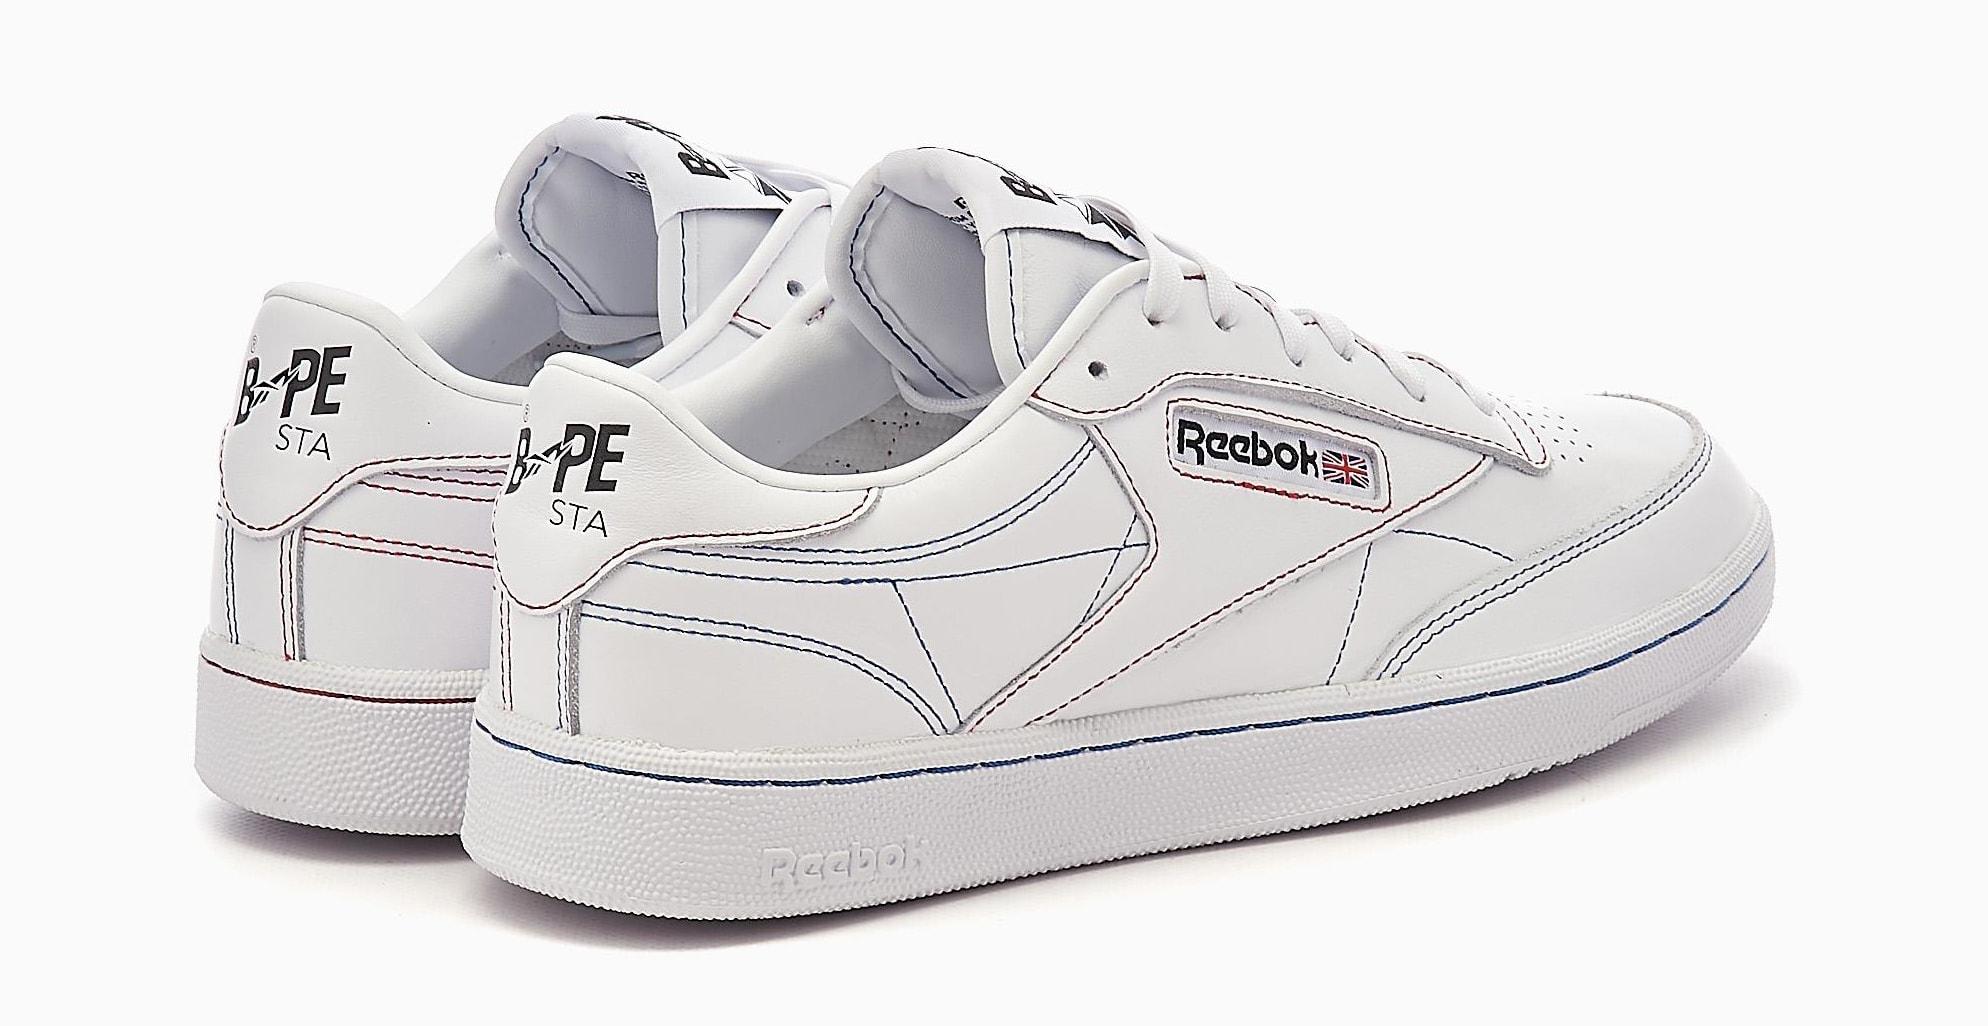 Bape x Reebok Club C Q47367 Heel